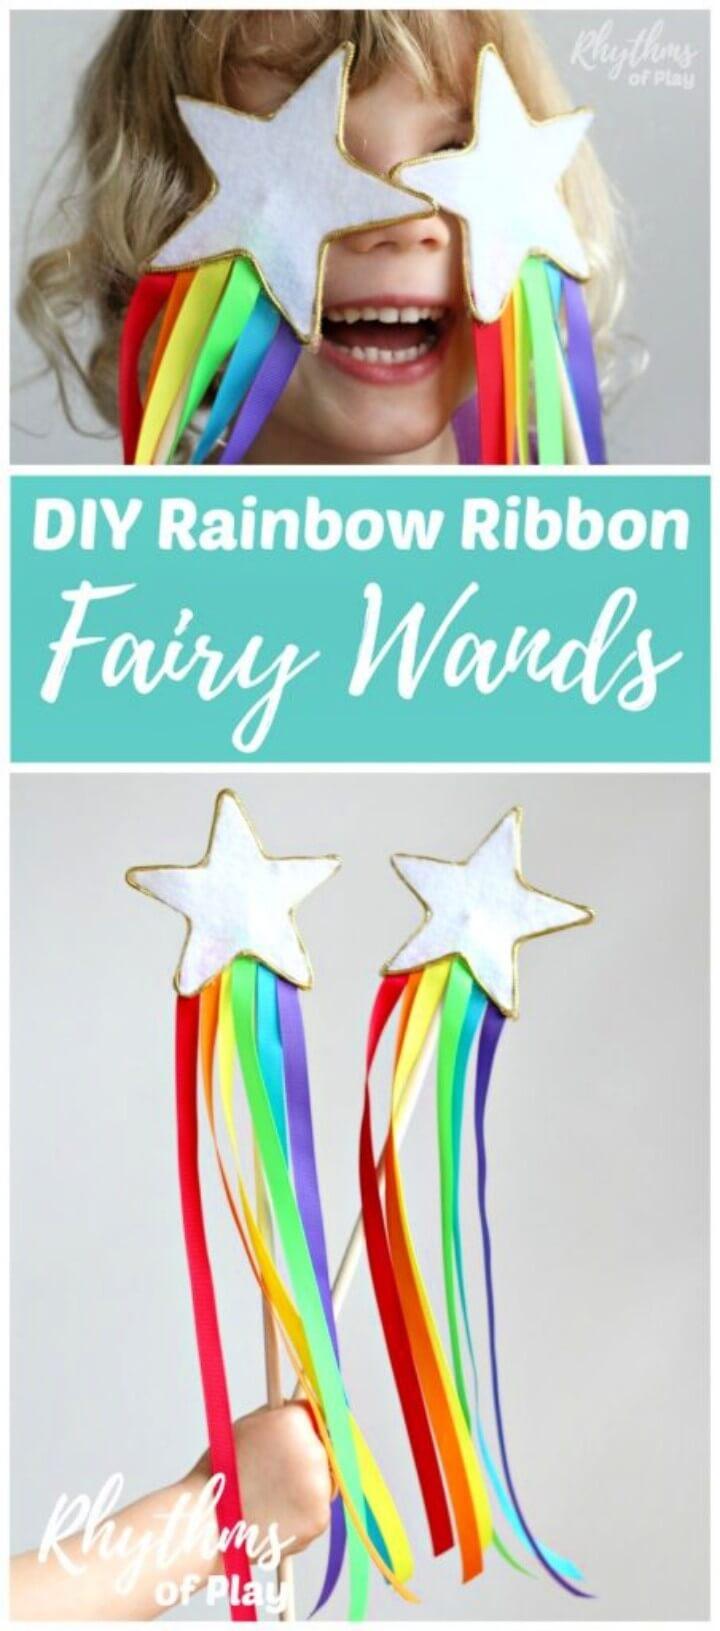 DIY Rainbow Ribbon Fairy Wands for Kids